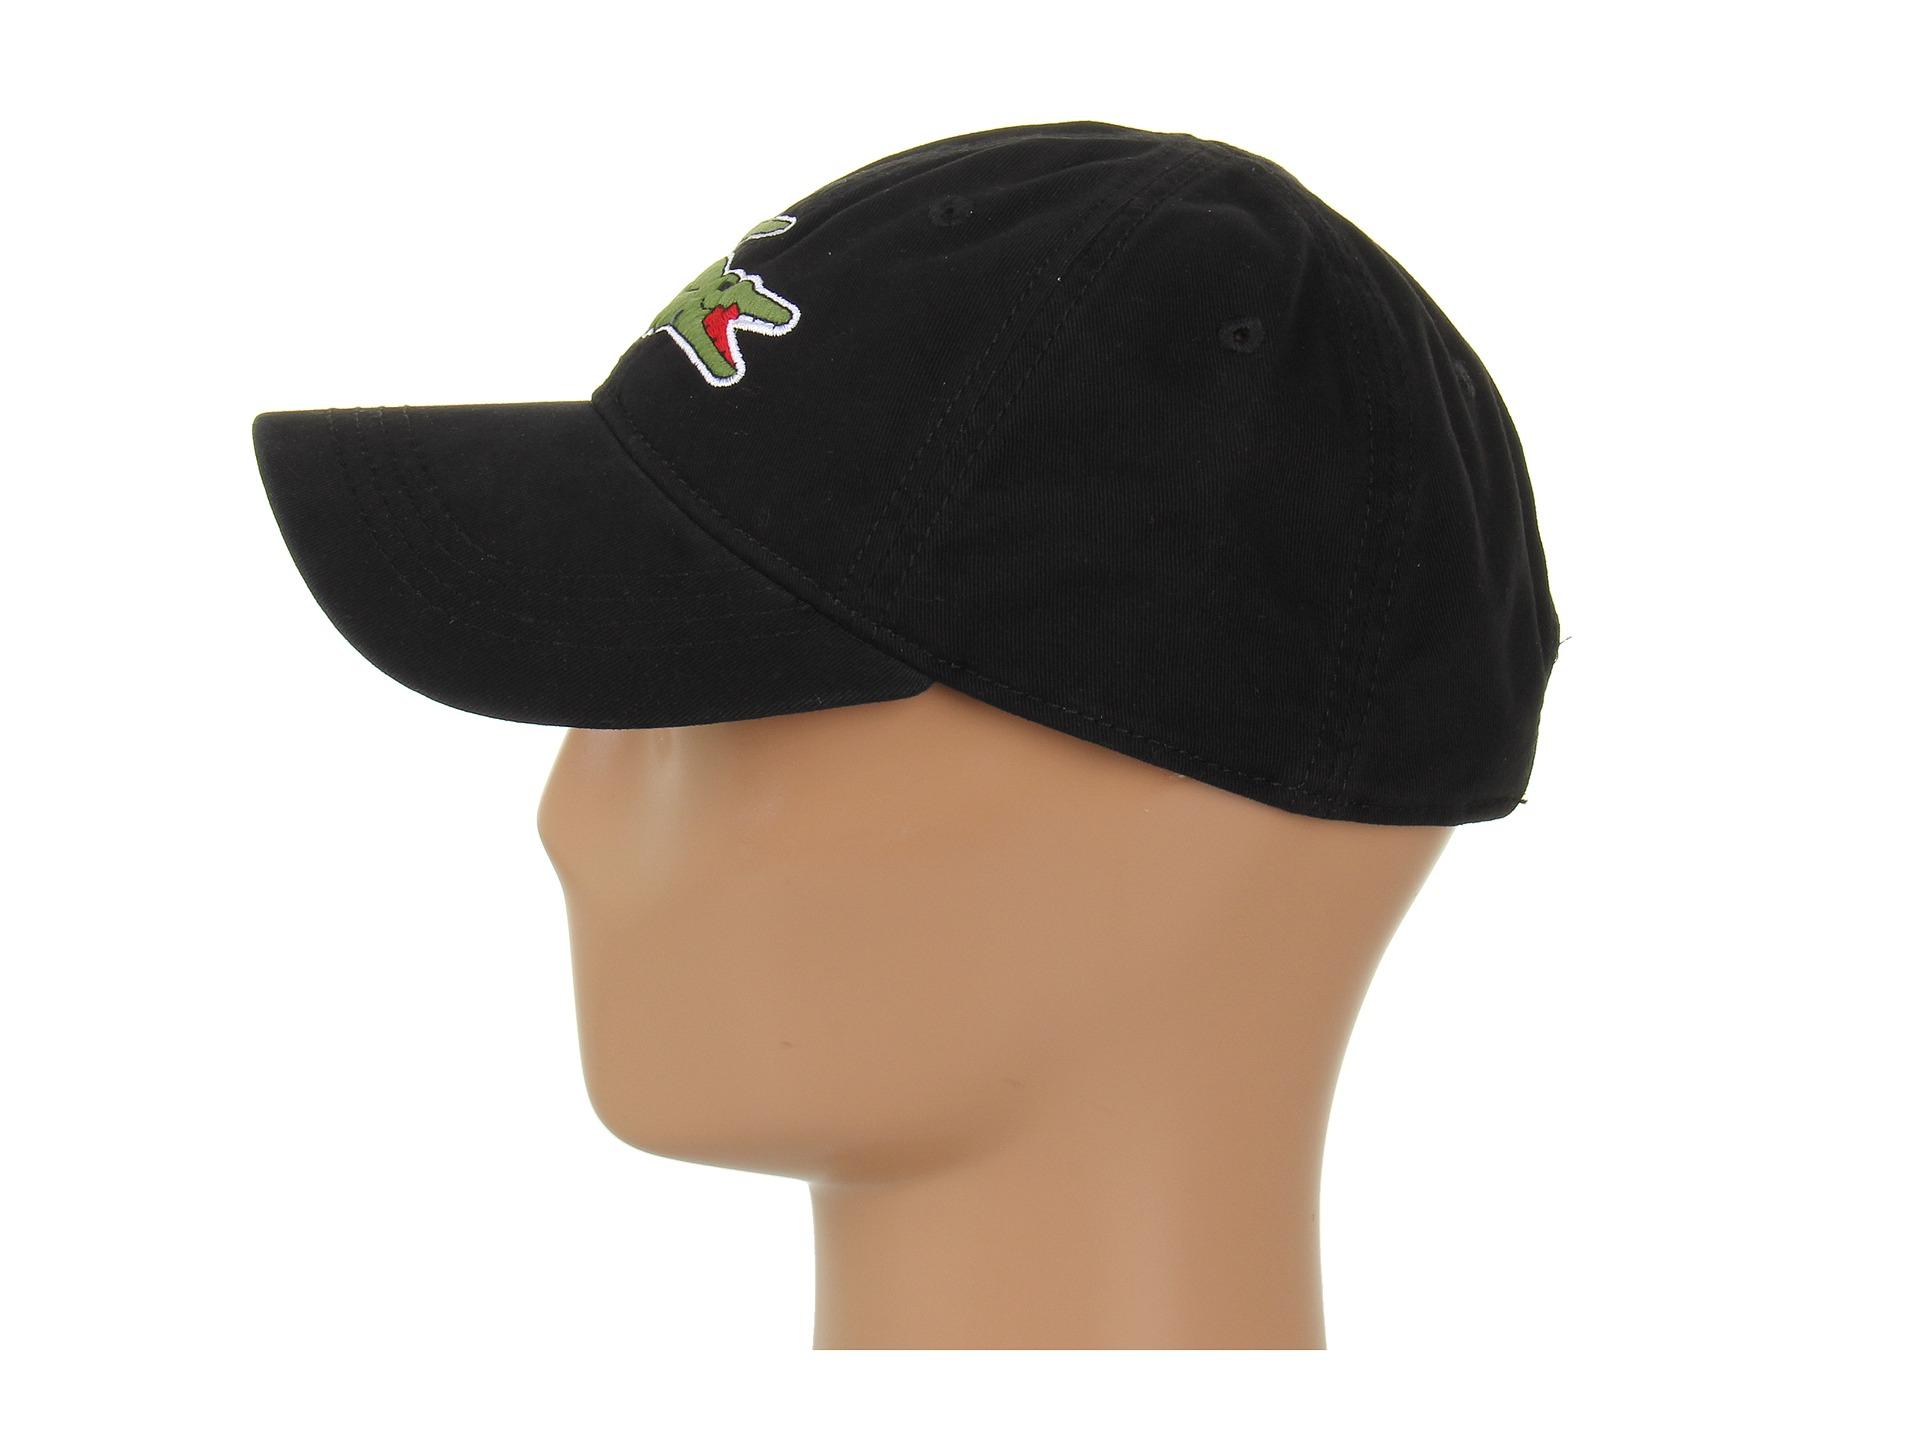 0f9a2bad12d Lyst - Lacoste Large Croc Gabardine Cap in Black for Men